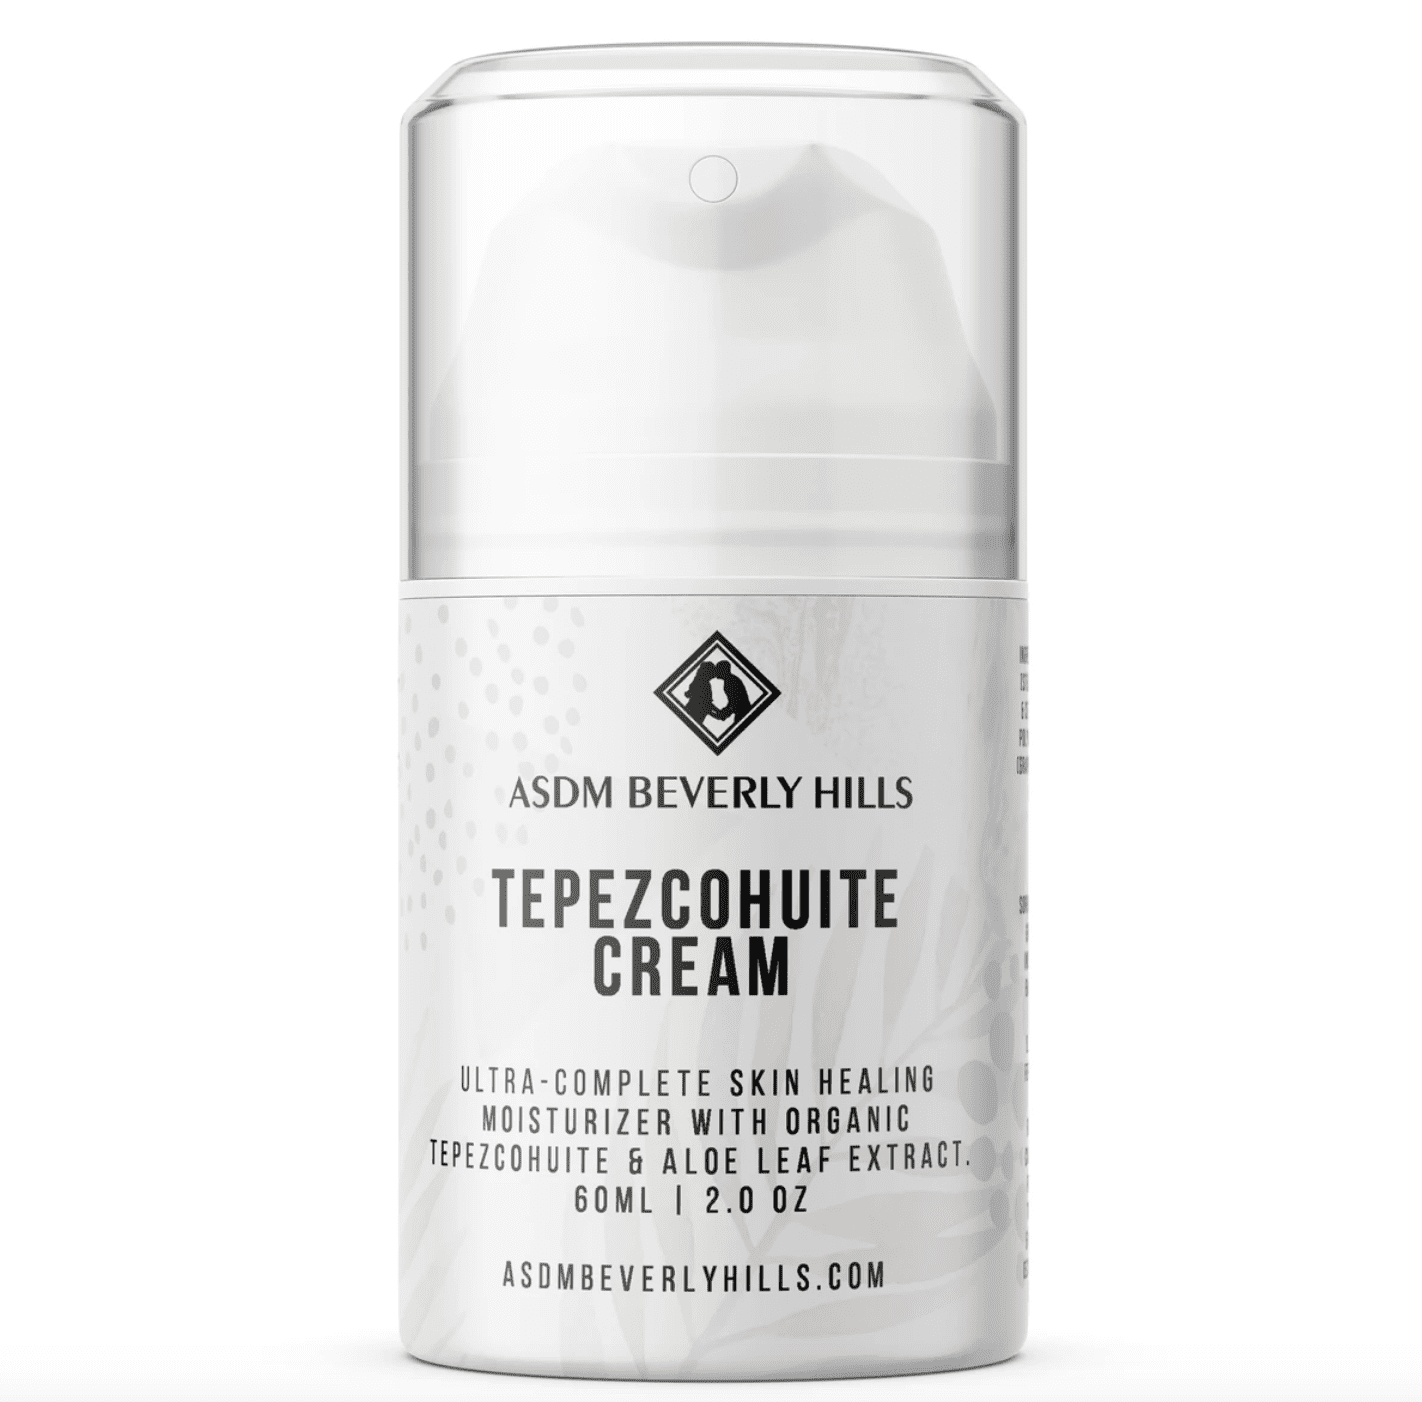 ASDM BEVERLY HILLS Tepezcohuite Cream